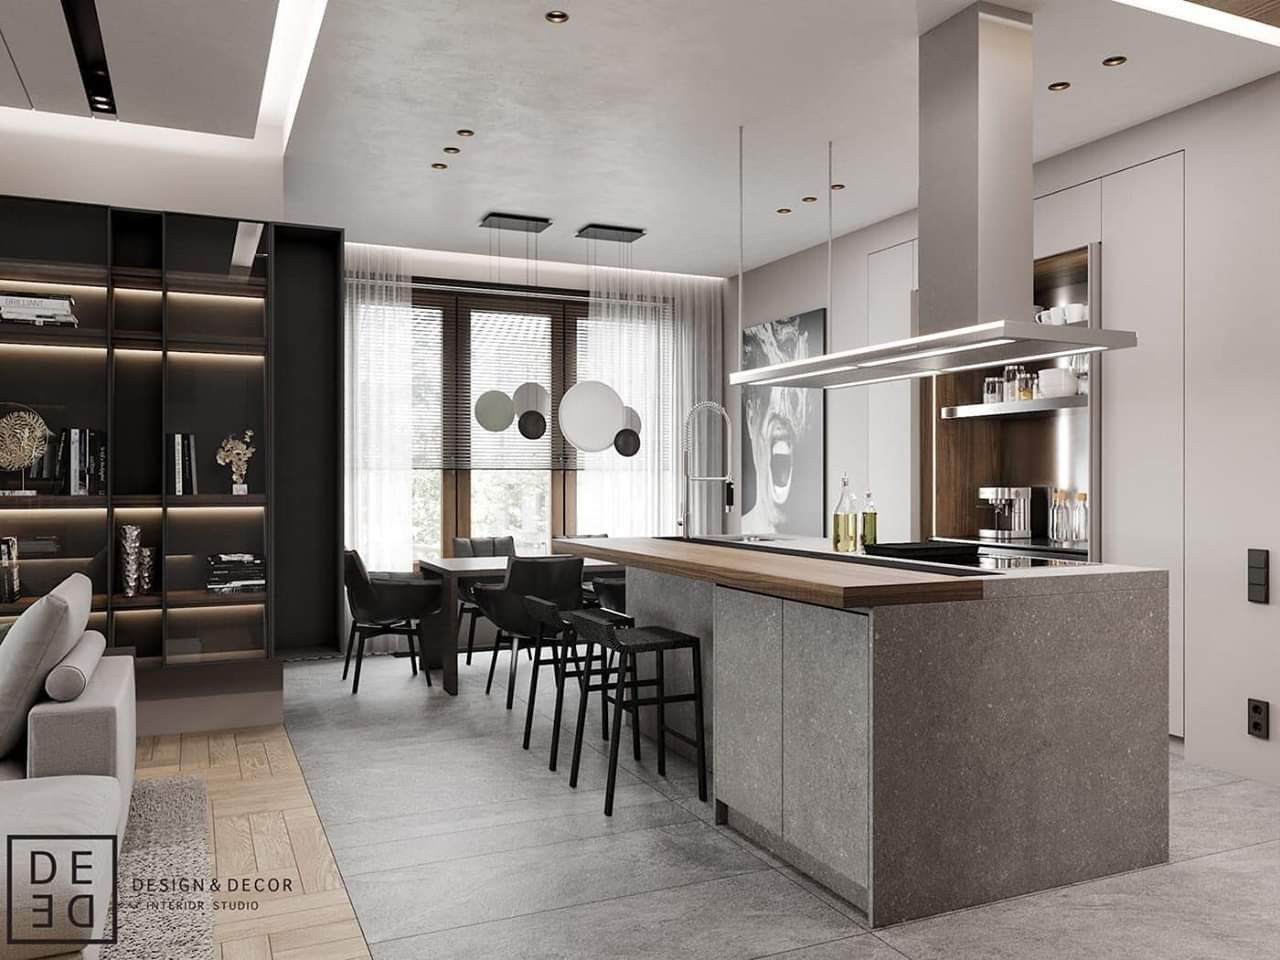 Modern Interior Design By De De Studio Www Wohnideen News Traumkuche Kuchen Ideen Modern